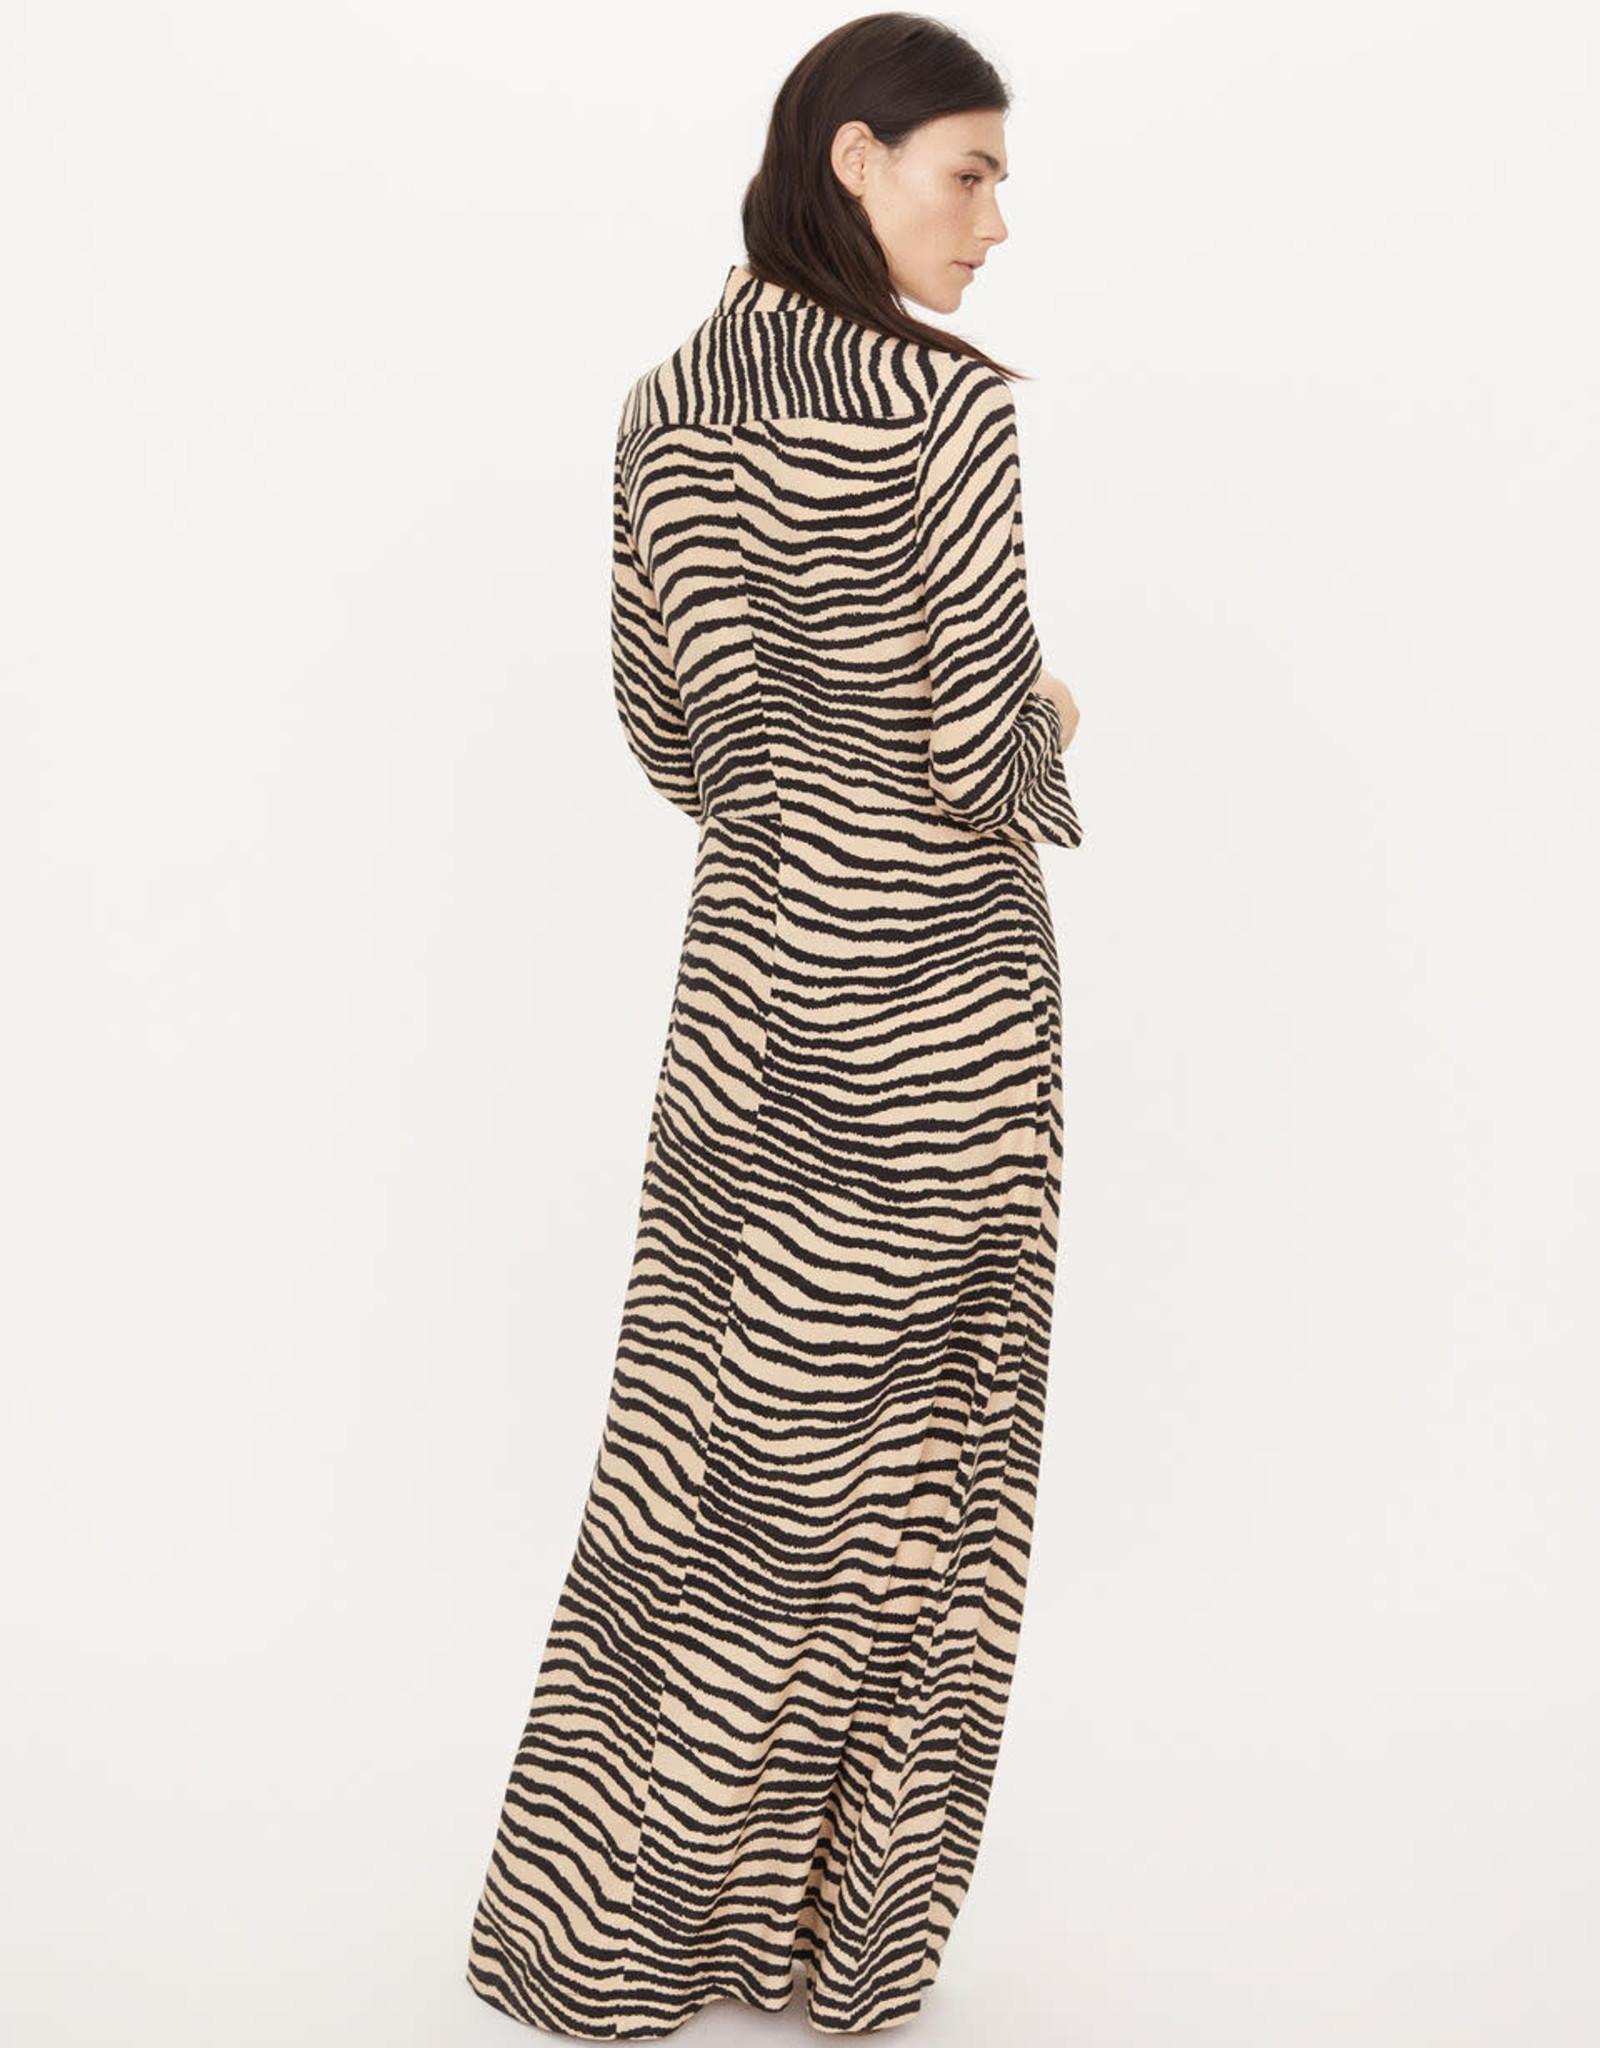 BY MALENE BIRGER The Diya Dress